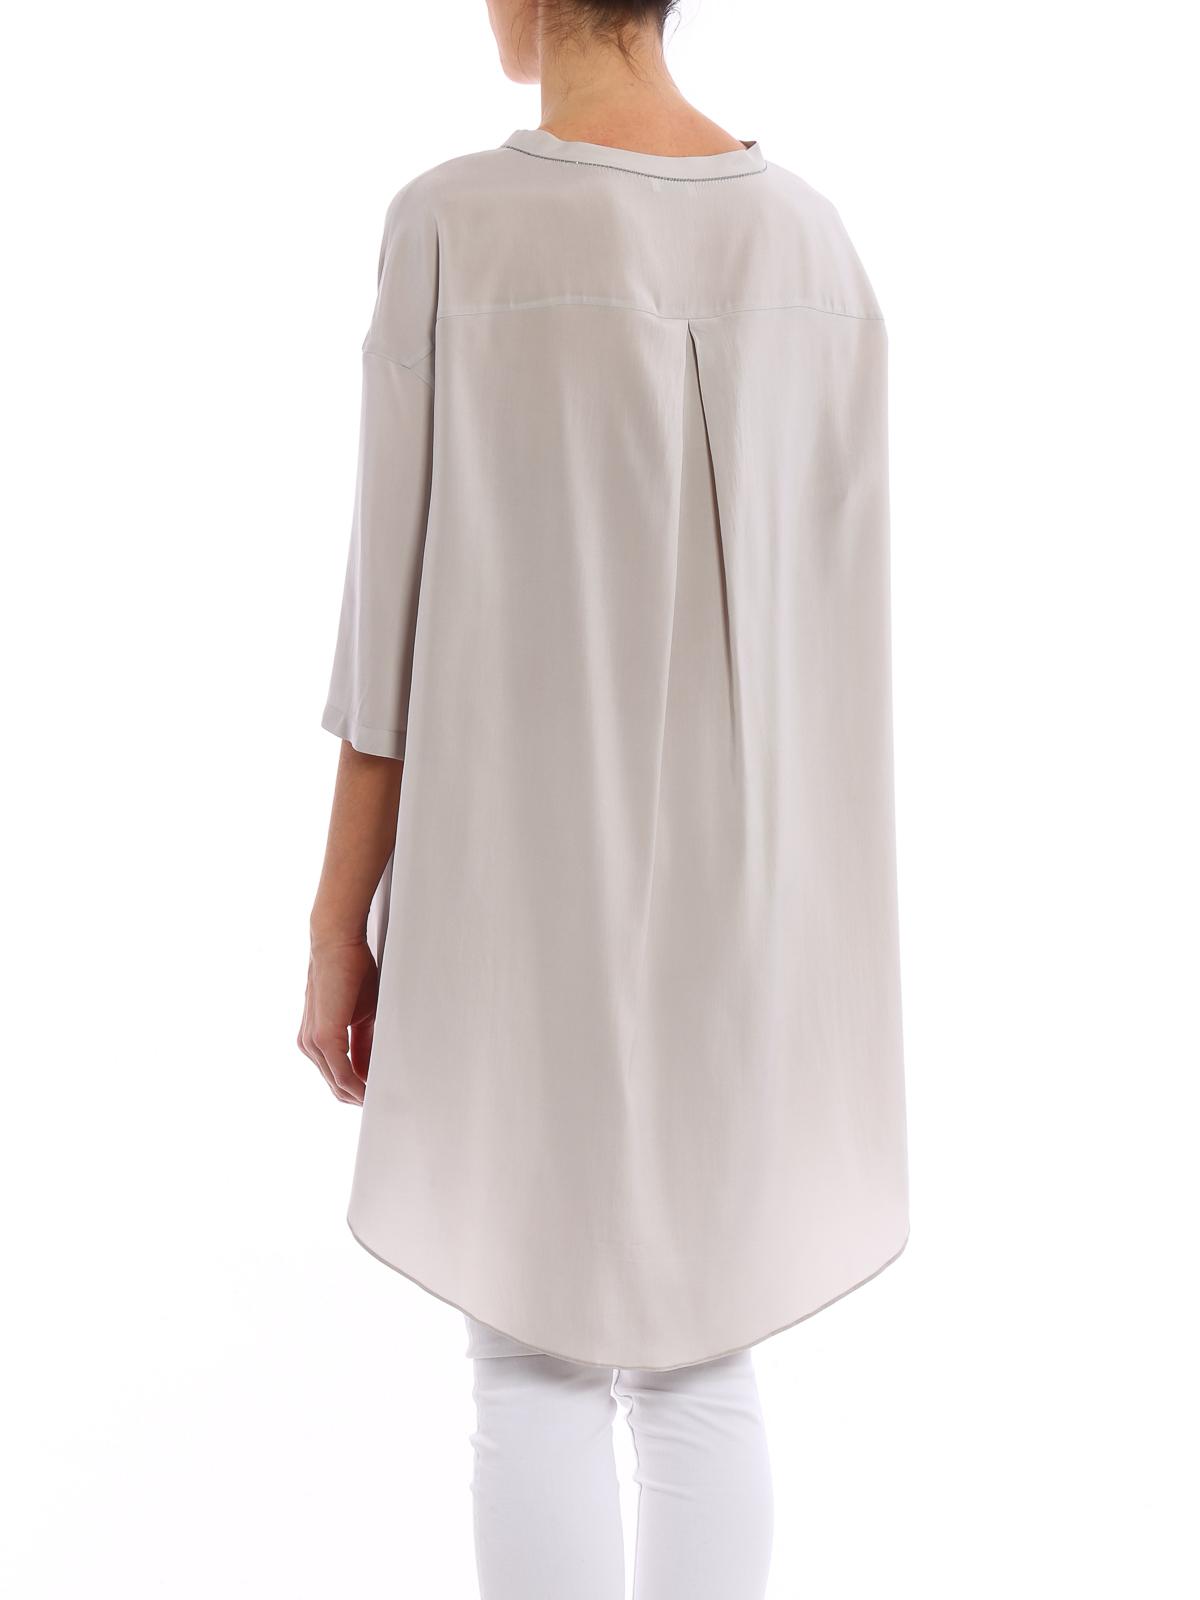 Asymmetric silk top Brunello Cucinelli Buy Cheap Limited Edition Cheap Sale Order Cheap Sale Footlocker Pictures WdwQWQWUJt